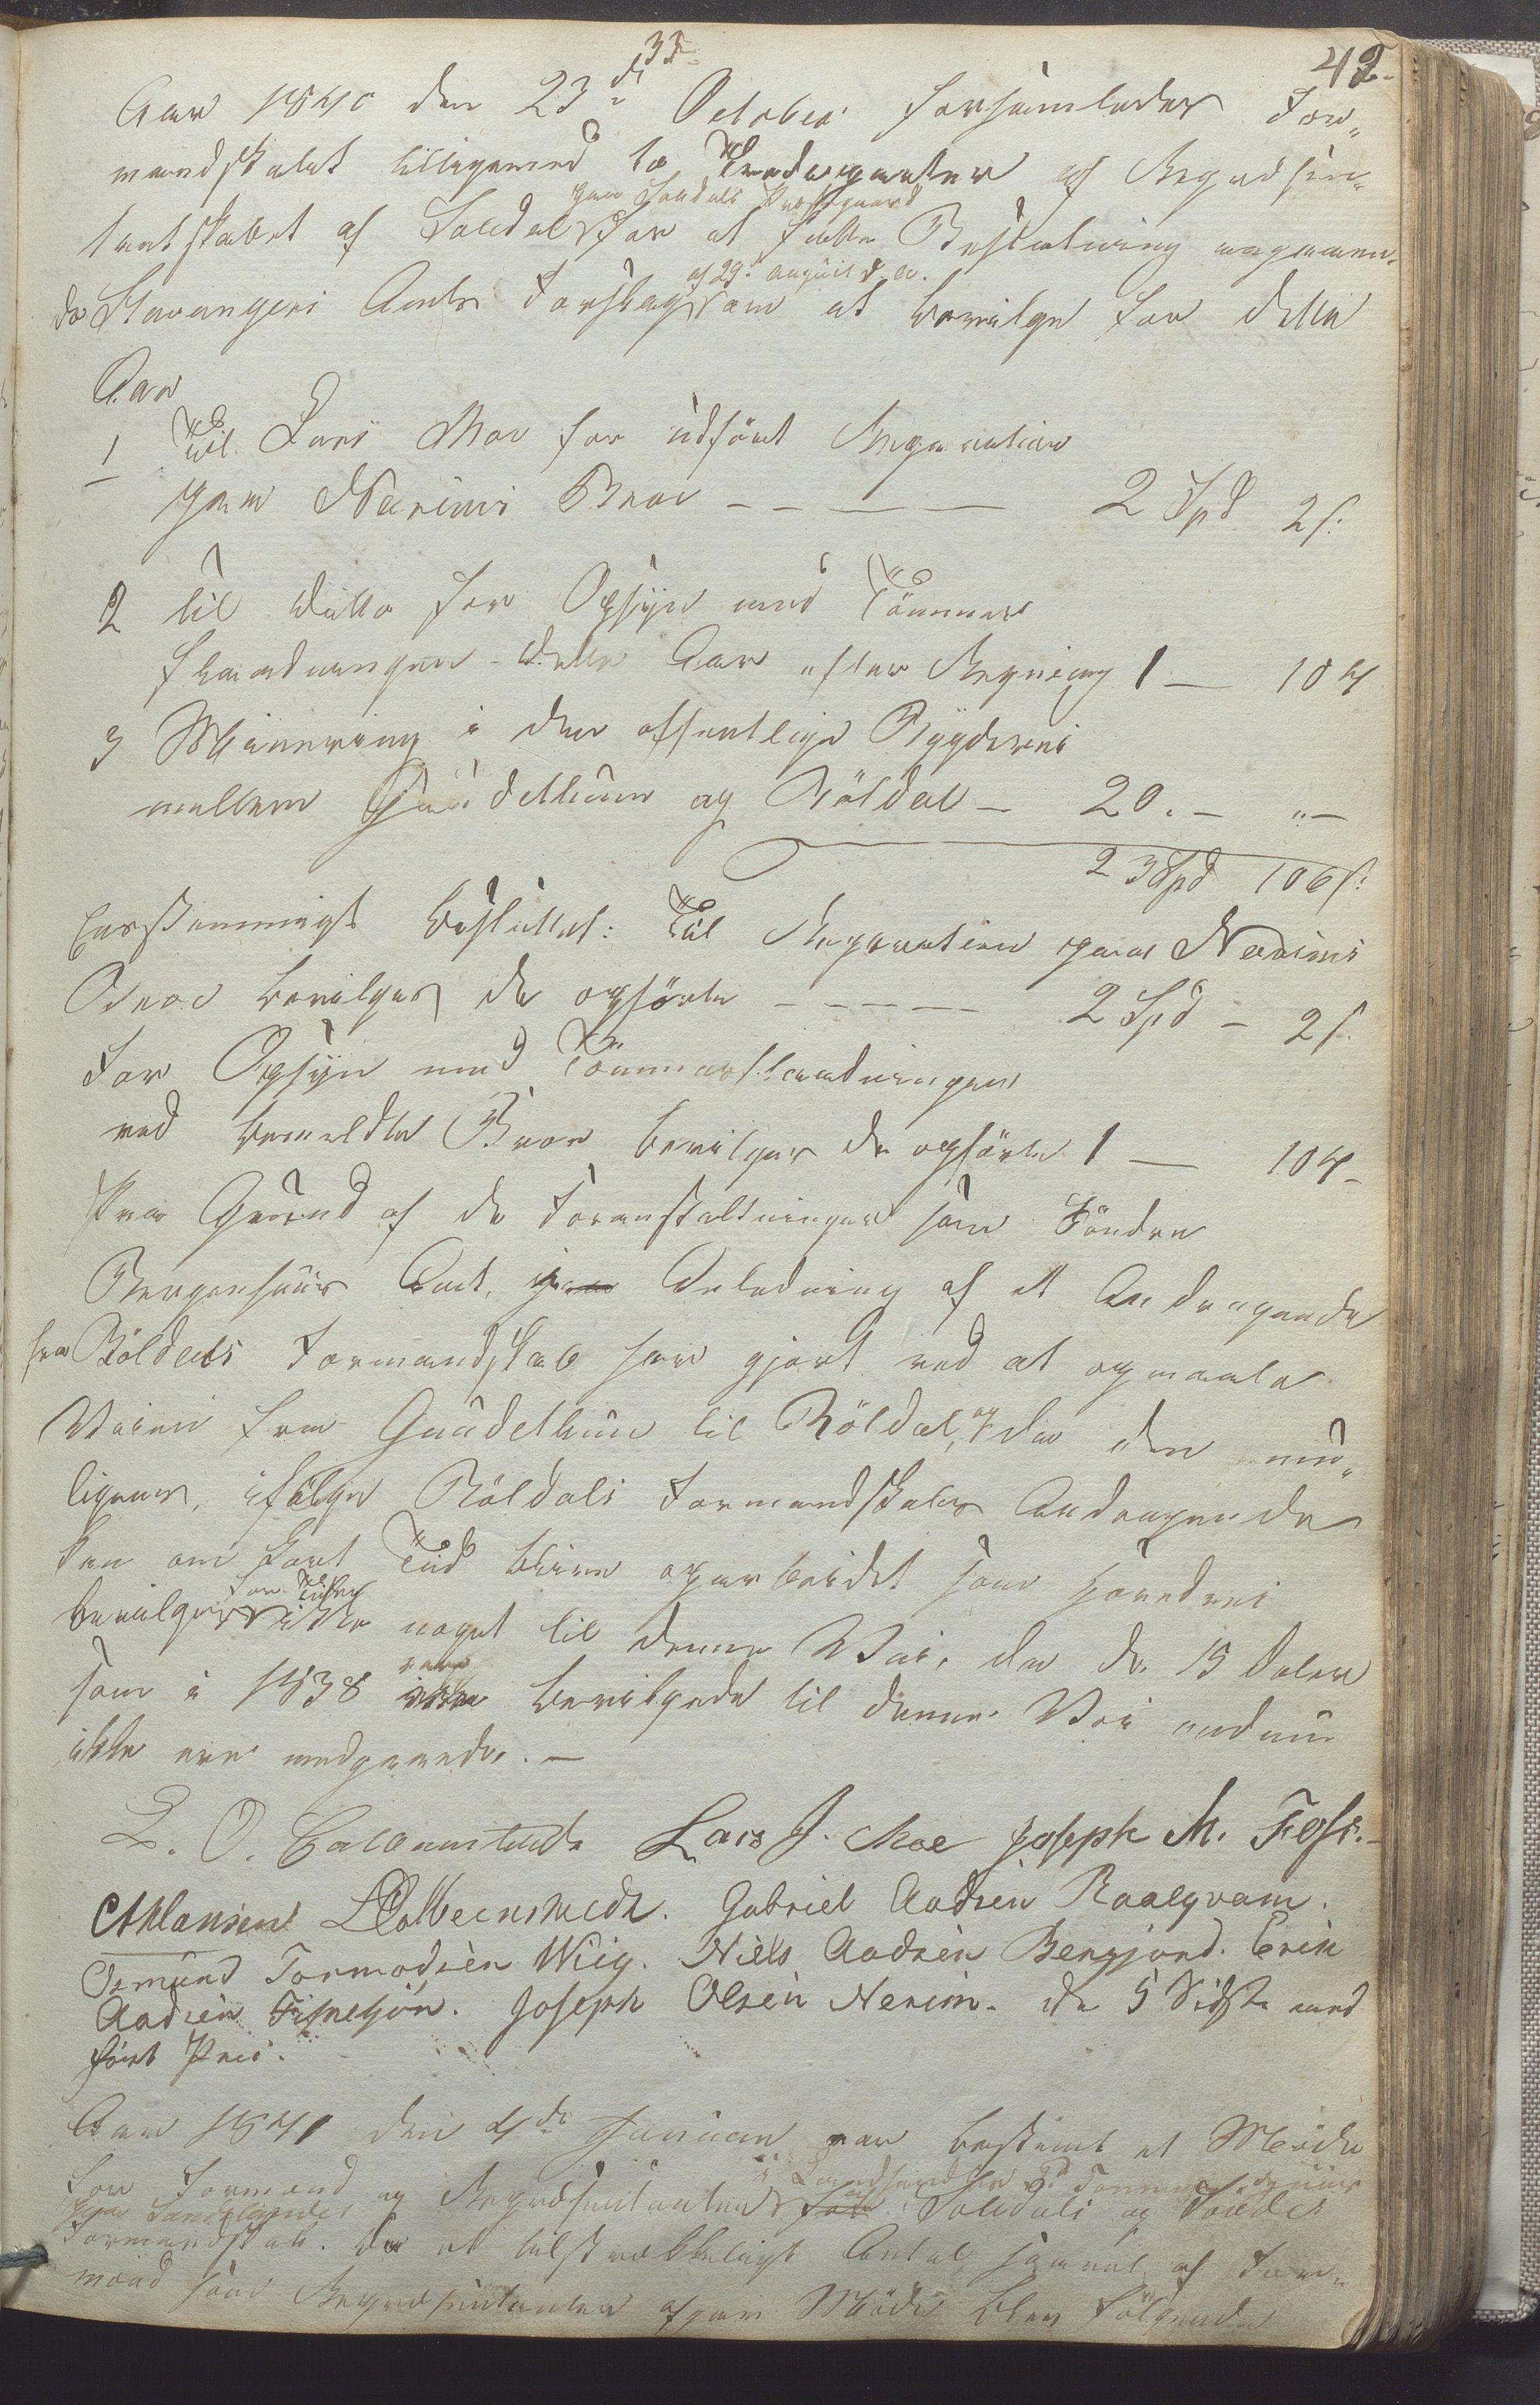 IKAR, Suldal kommune - Formannskapet/Rådmannen, A/Aa/L0001: Møtebok, 1837-1876, s. 42a